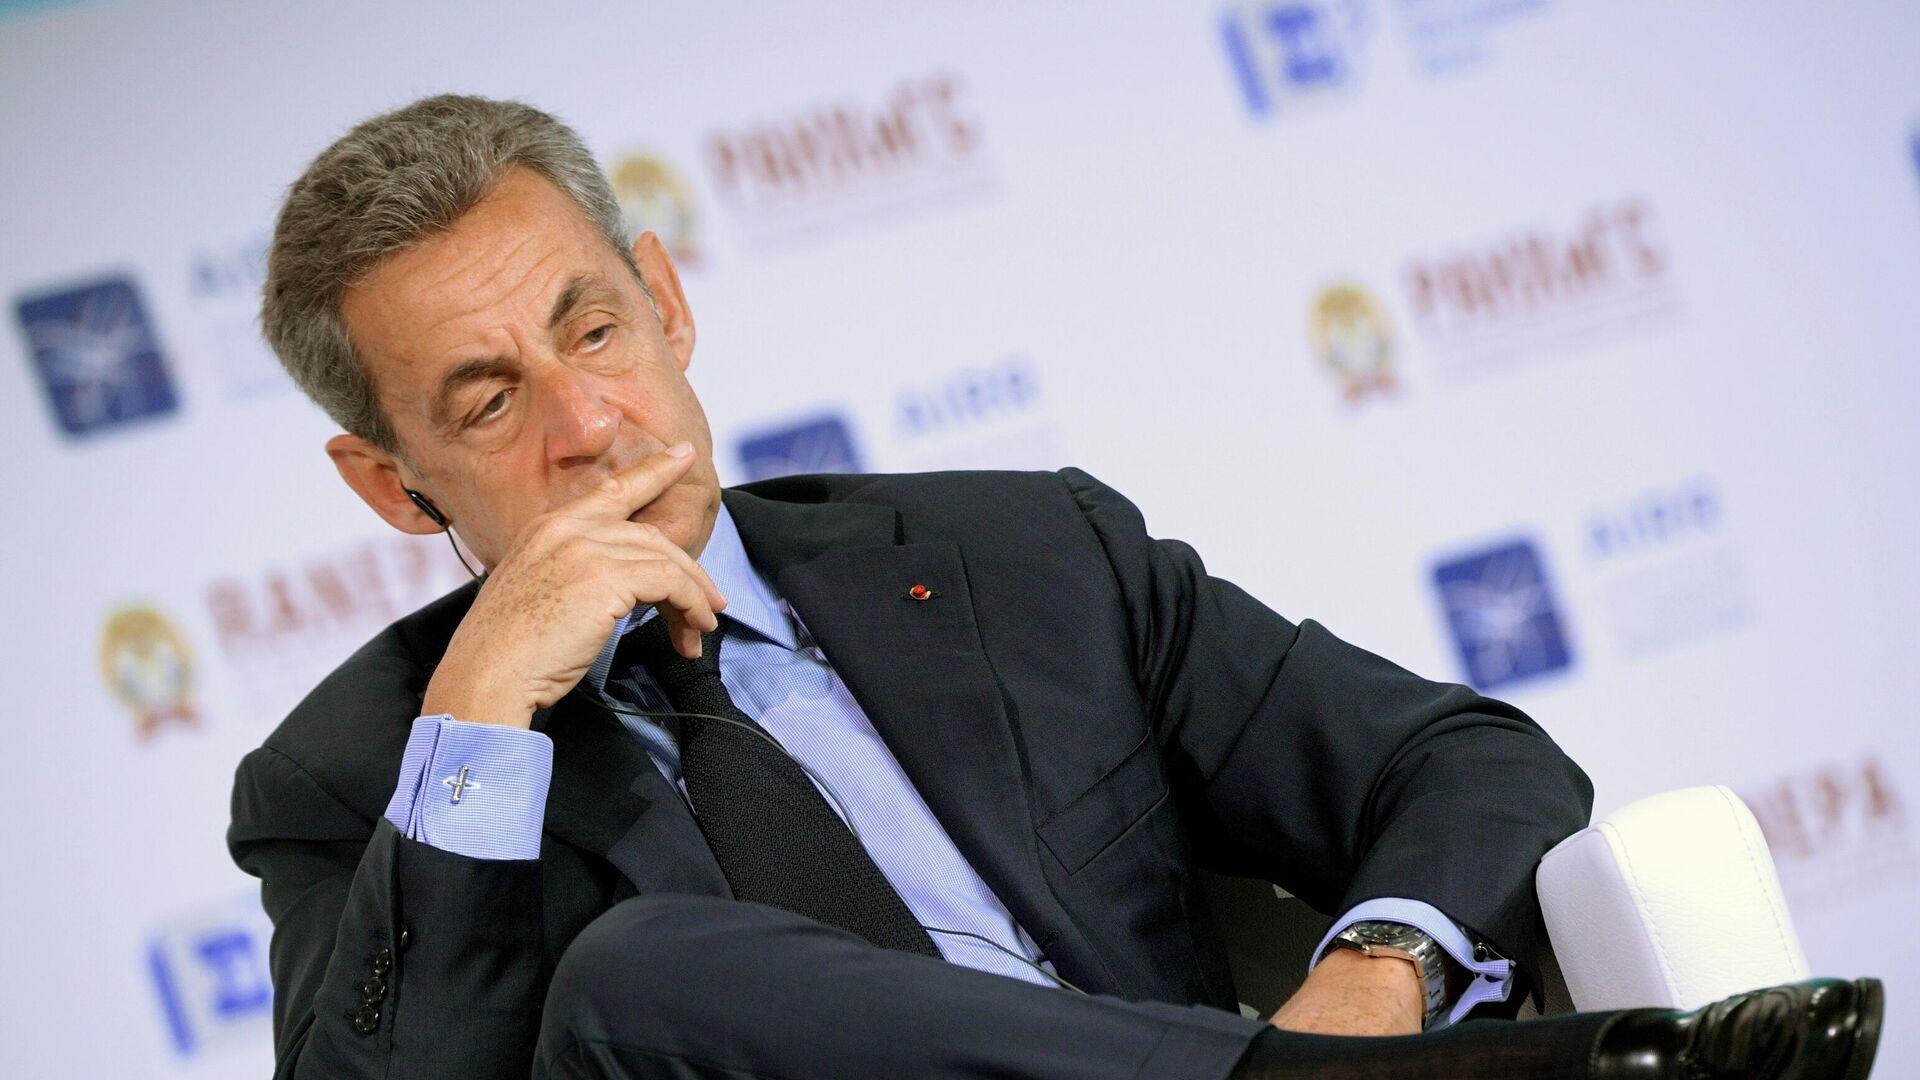 Экс-президент Франции Николя Саркози на XI Гайдаровском форуме в Москве - РИА Новости, 1920, 16.10.2020